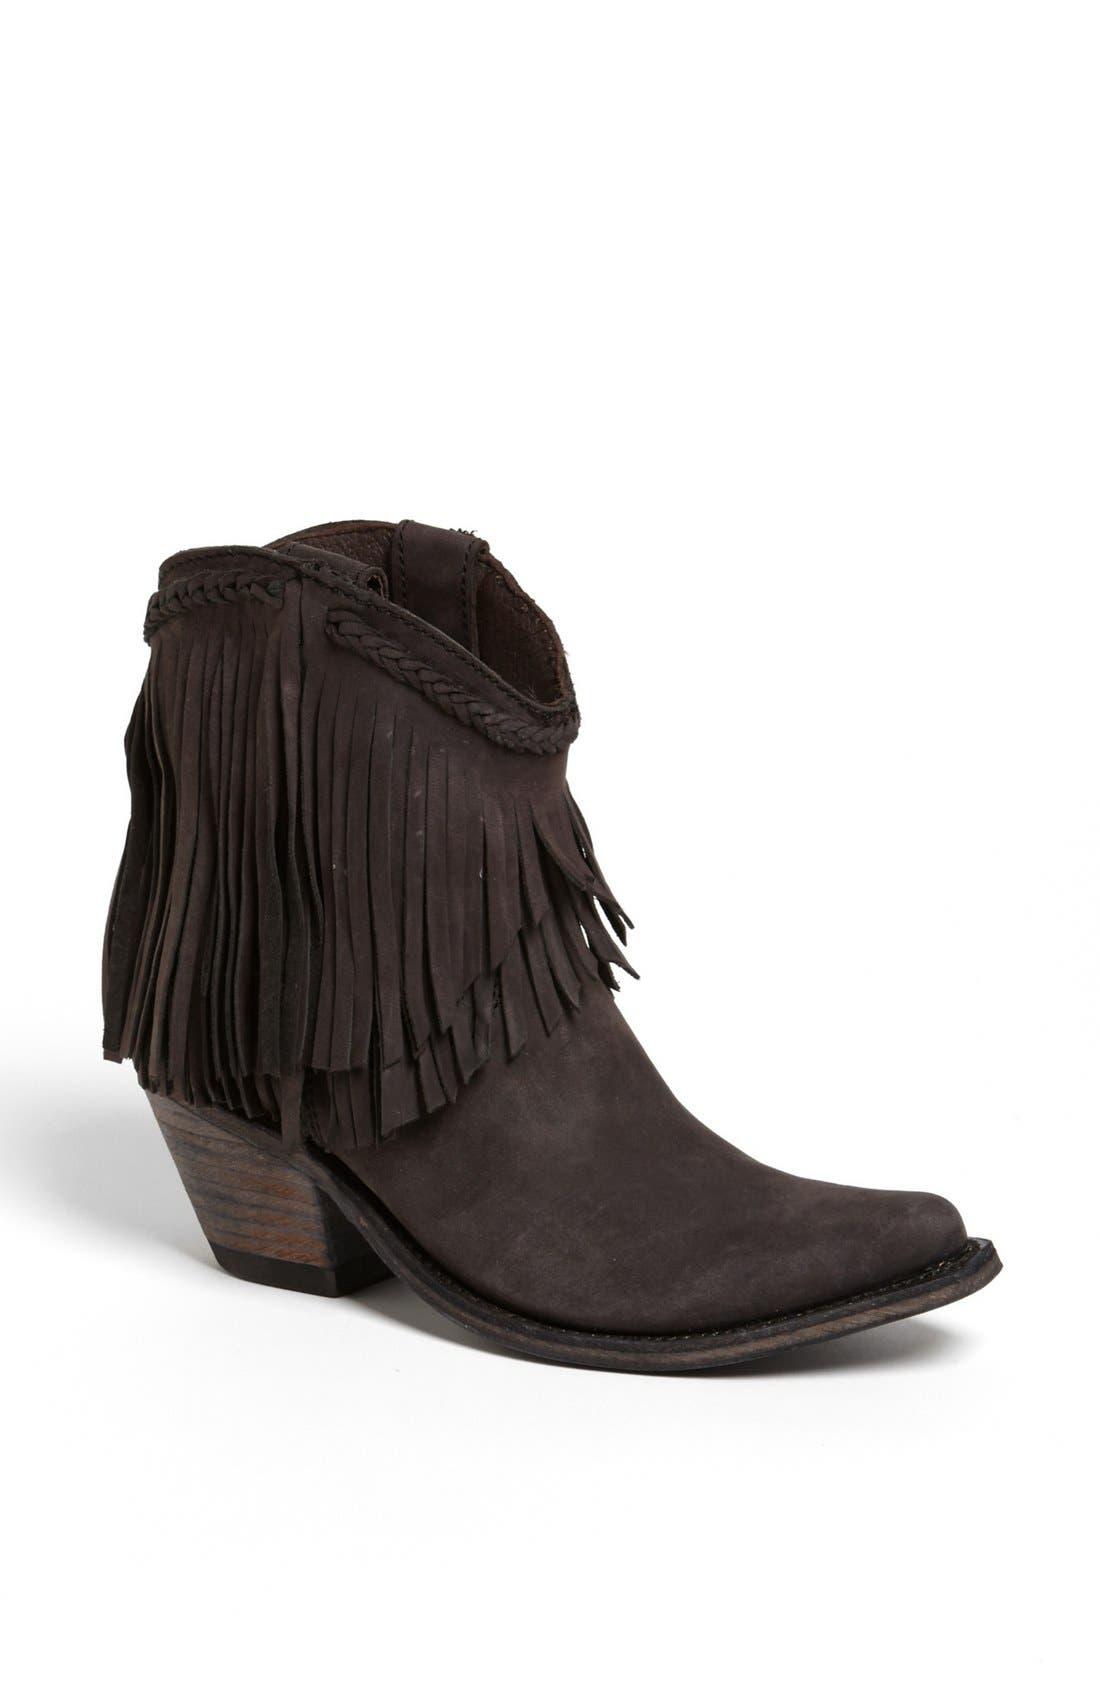 Alternate Image 1 Selected - Liberty Black Fringed Short Boot